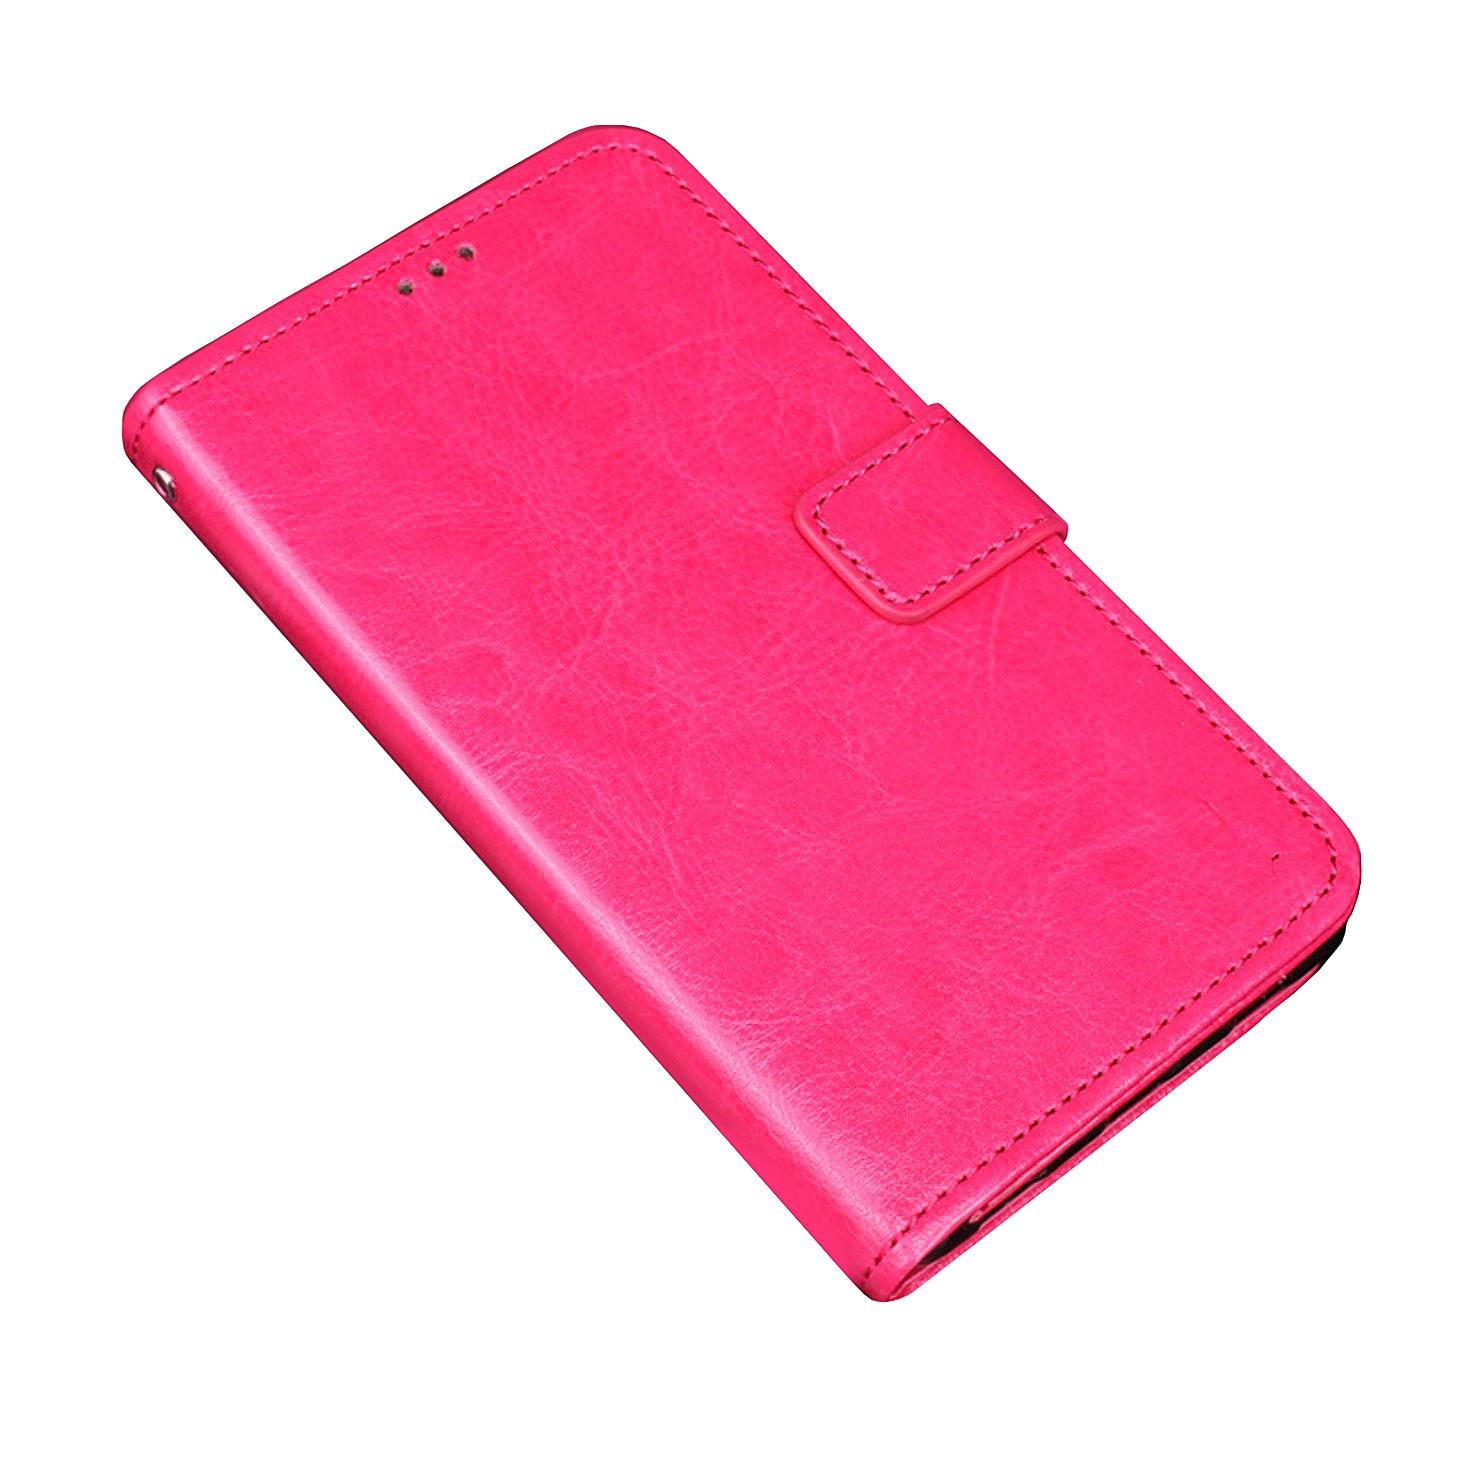 Чехол-книжка MyPads для Huawei Honor V20/Huawei Honor View 20 с мульти-подставкой застёжкой и визитницей розовый